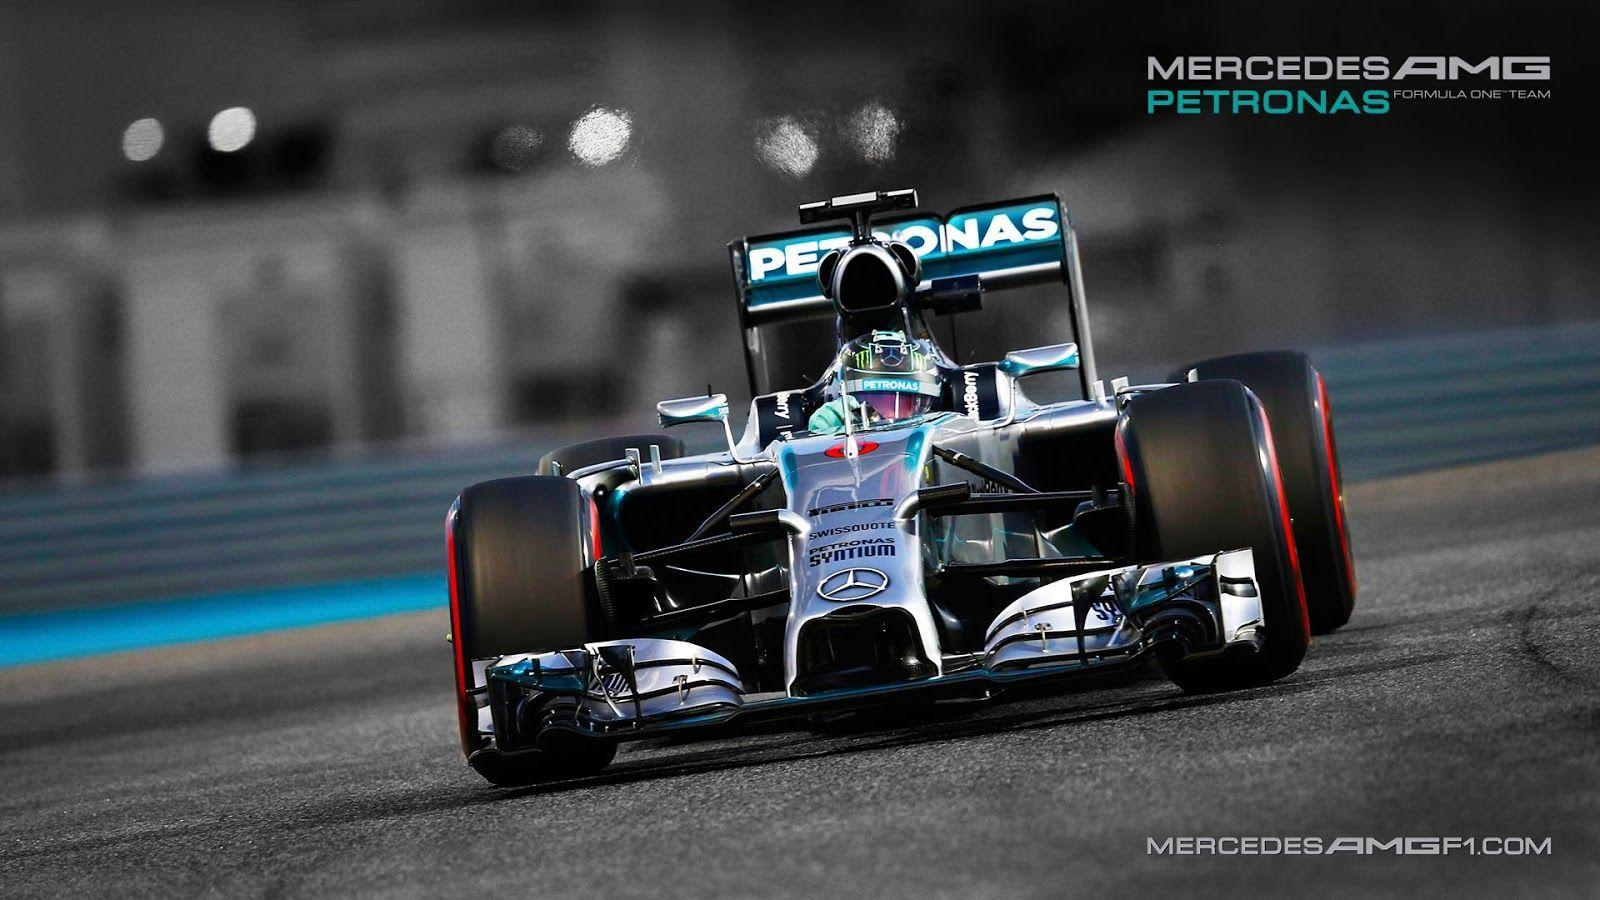 Mercedes Benz Petronas Wallpapers Wallpaper Cave